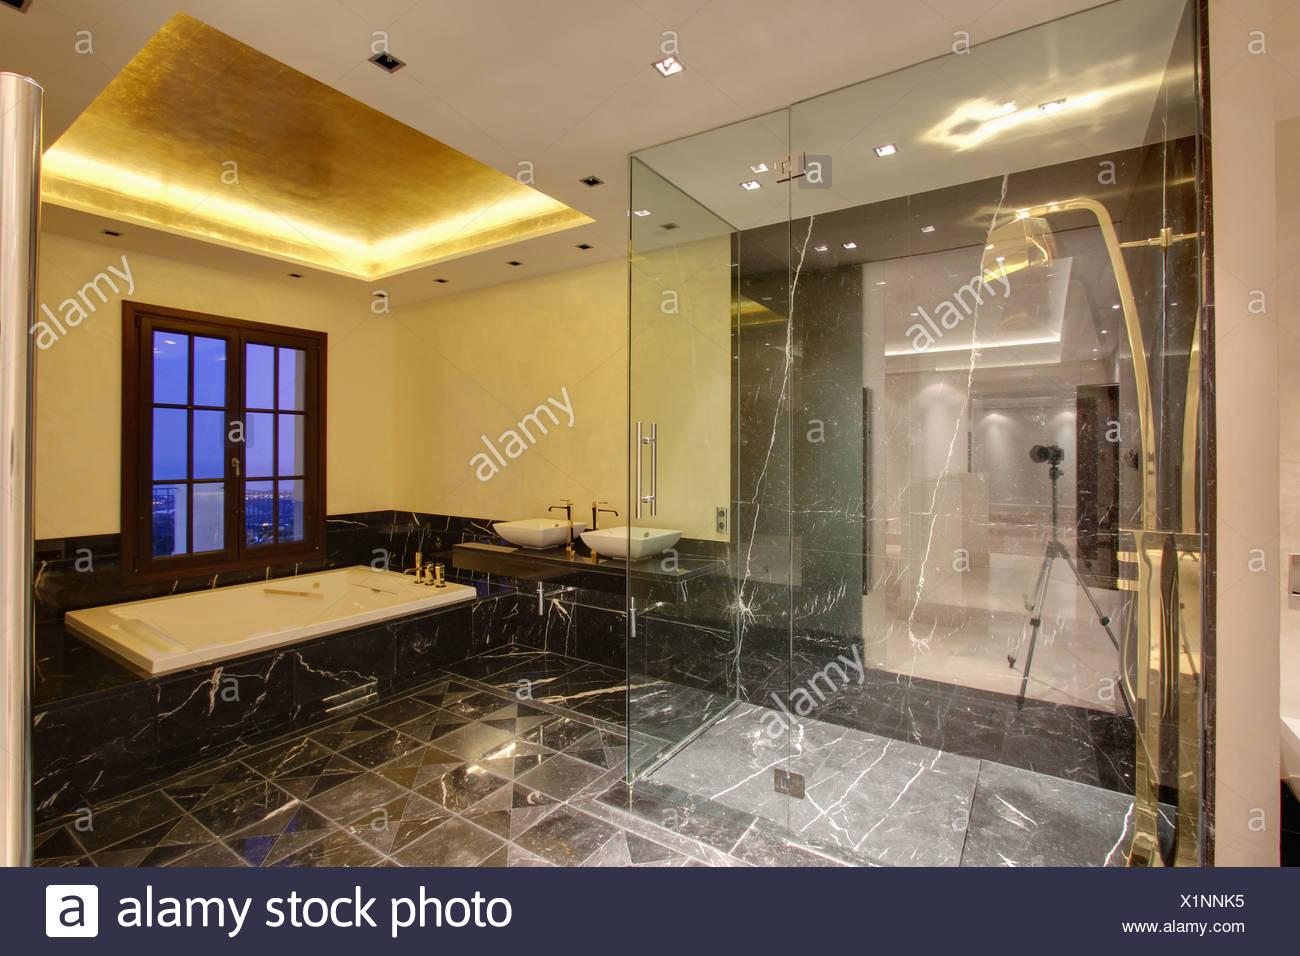 Sur l\'écran de verre promenade dans la douche en espagnol ...